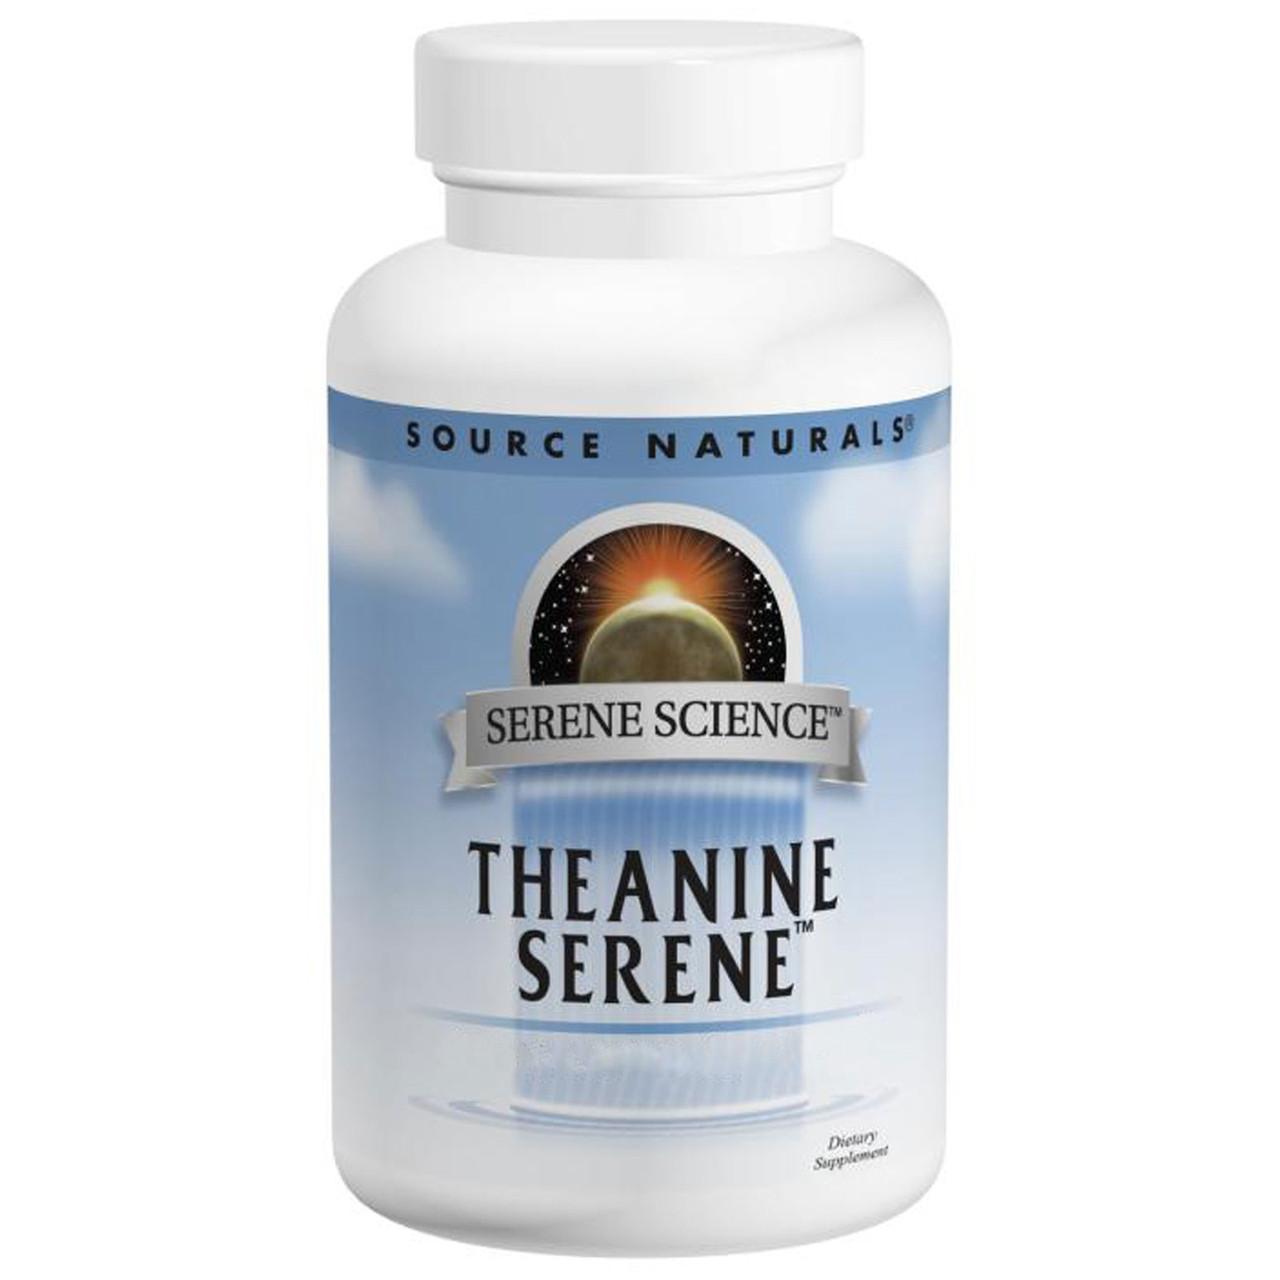 Комплекс  «Теанин Спокойствие», Source Natural, 60 таблеток. Сделано в США.